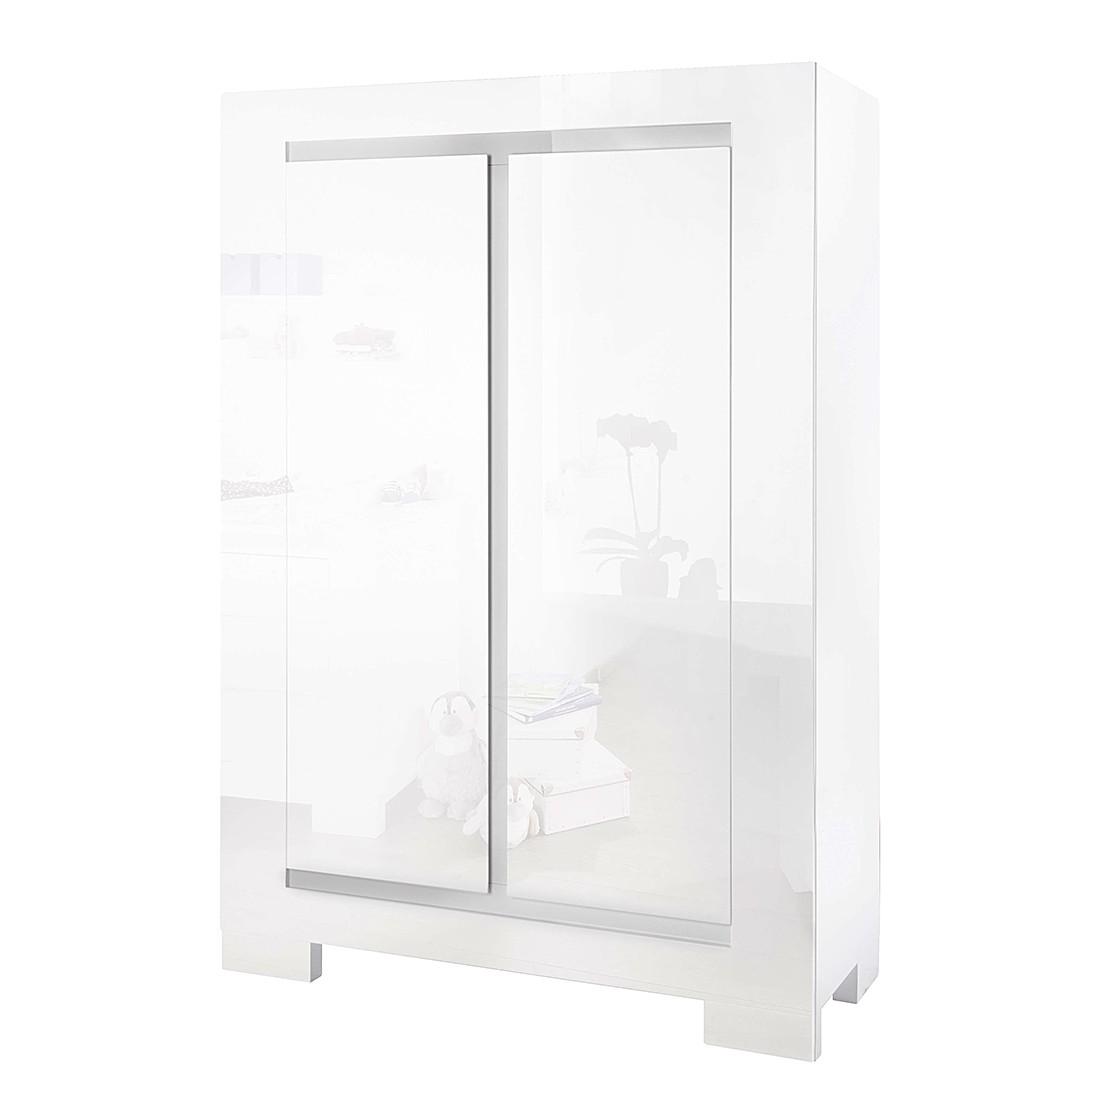 Armoire à vêtements Sky I - Vernis blanc, Pinolino